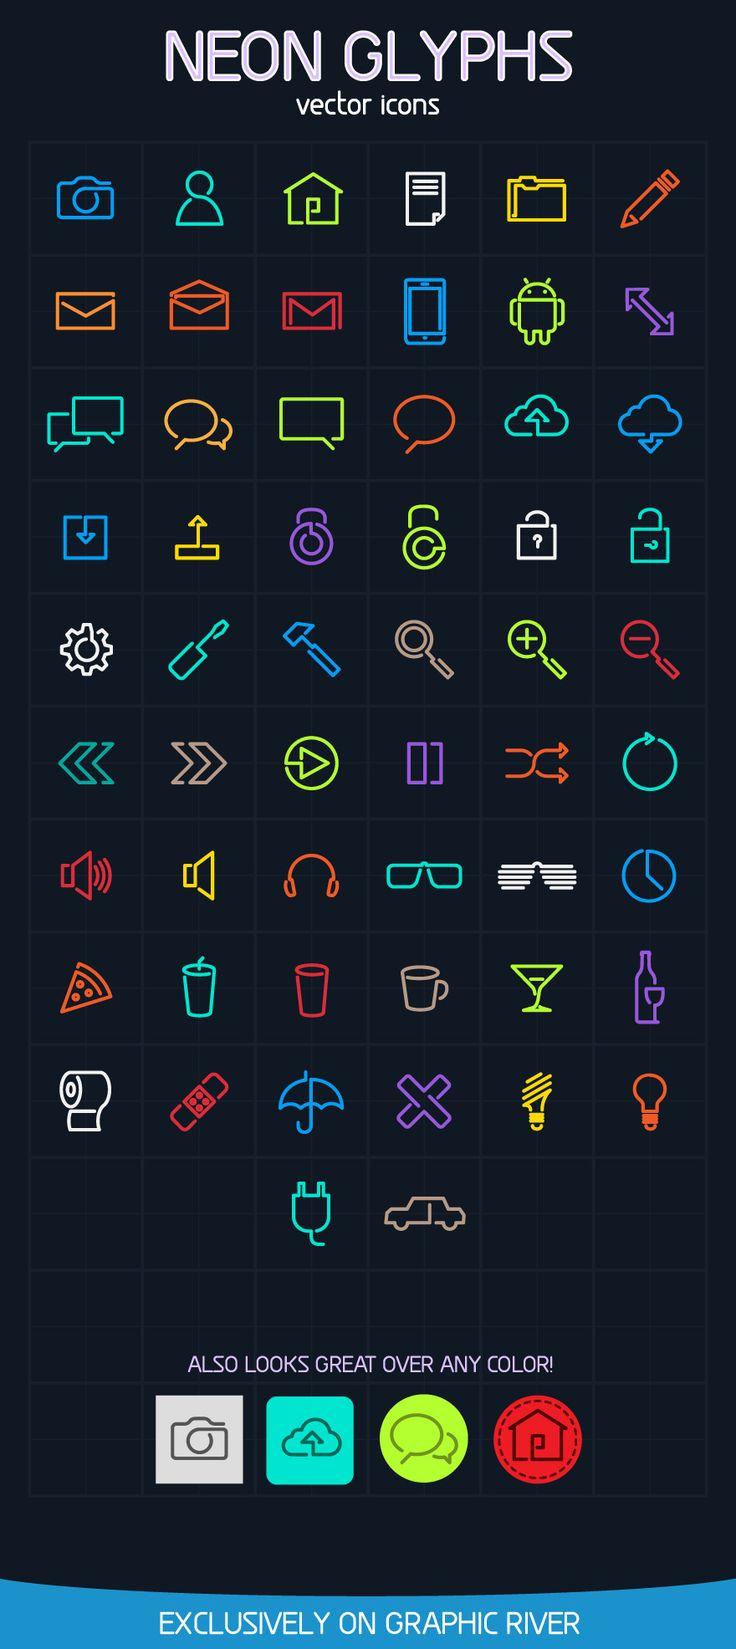 Neon Glyphs Vector Icons